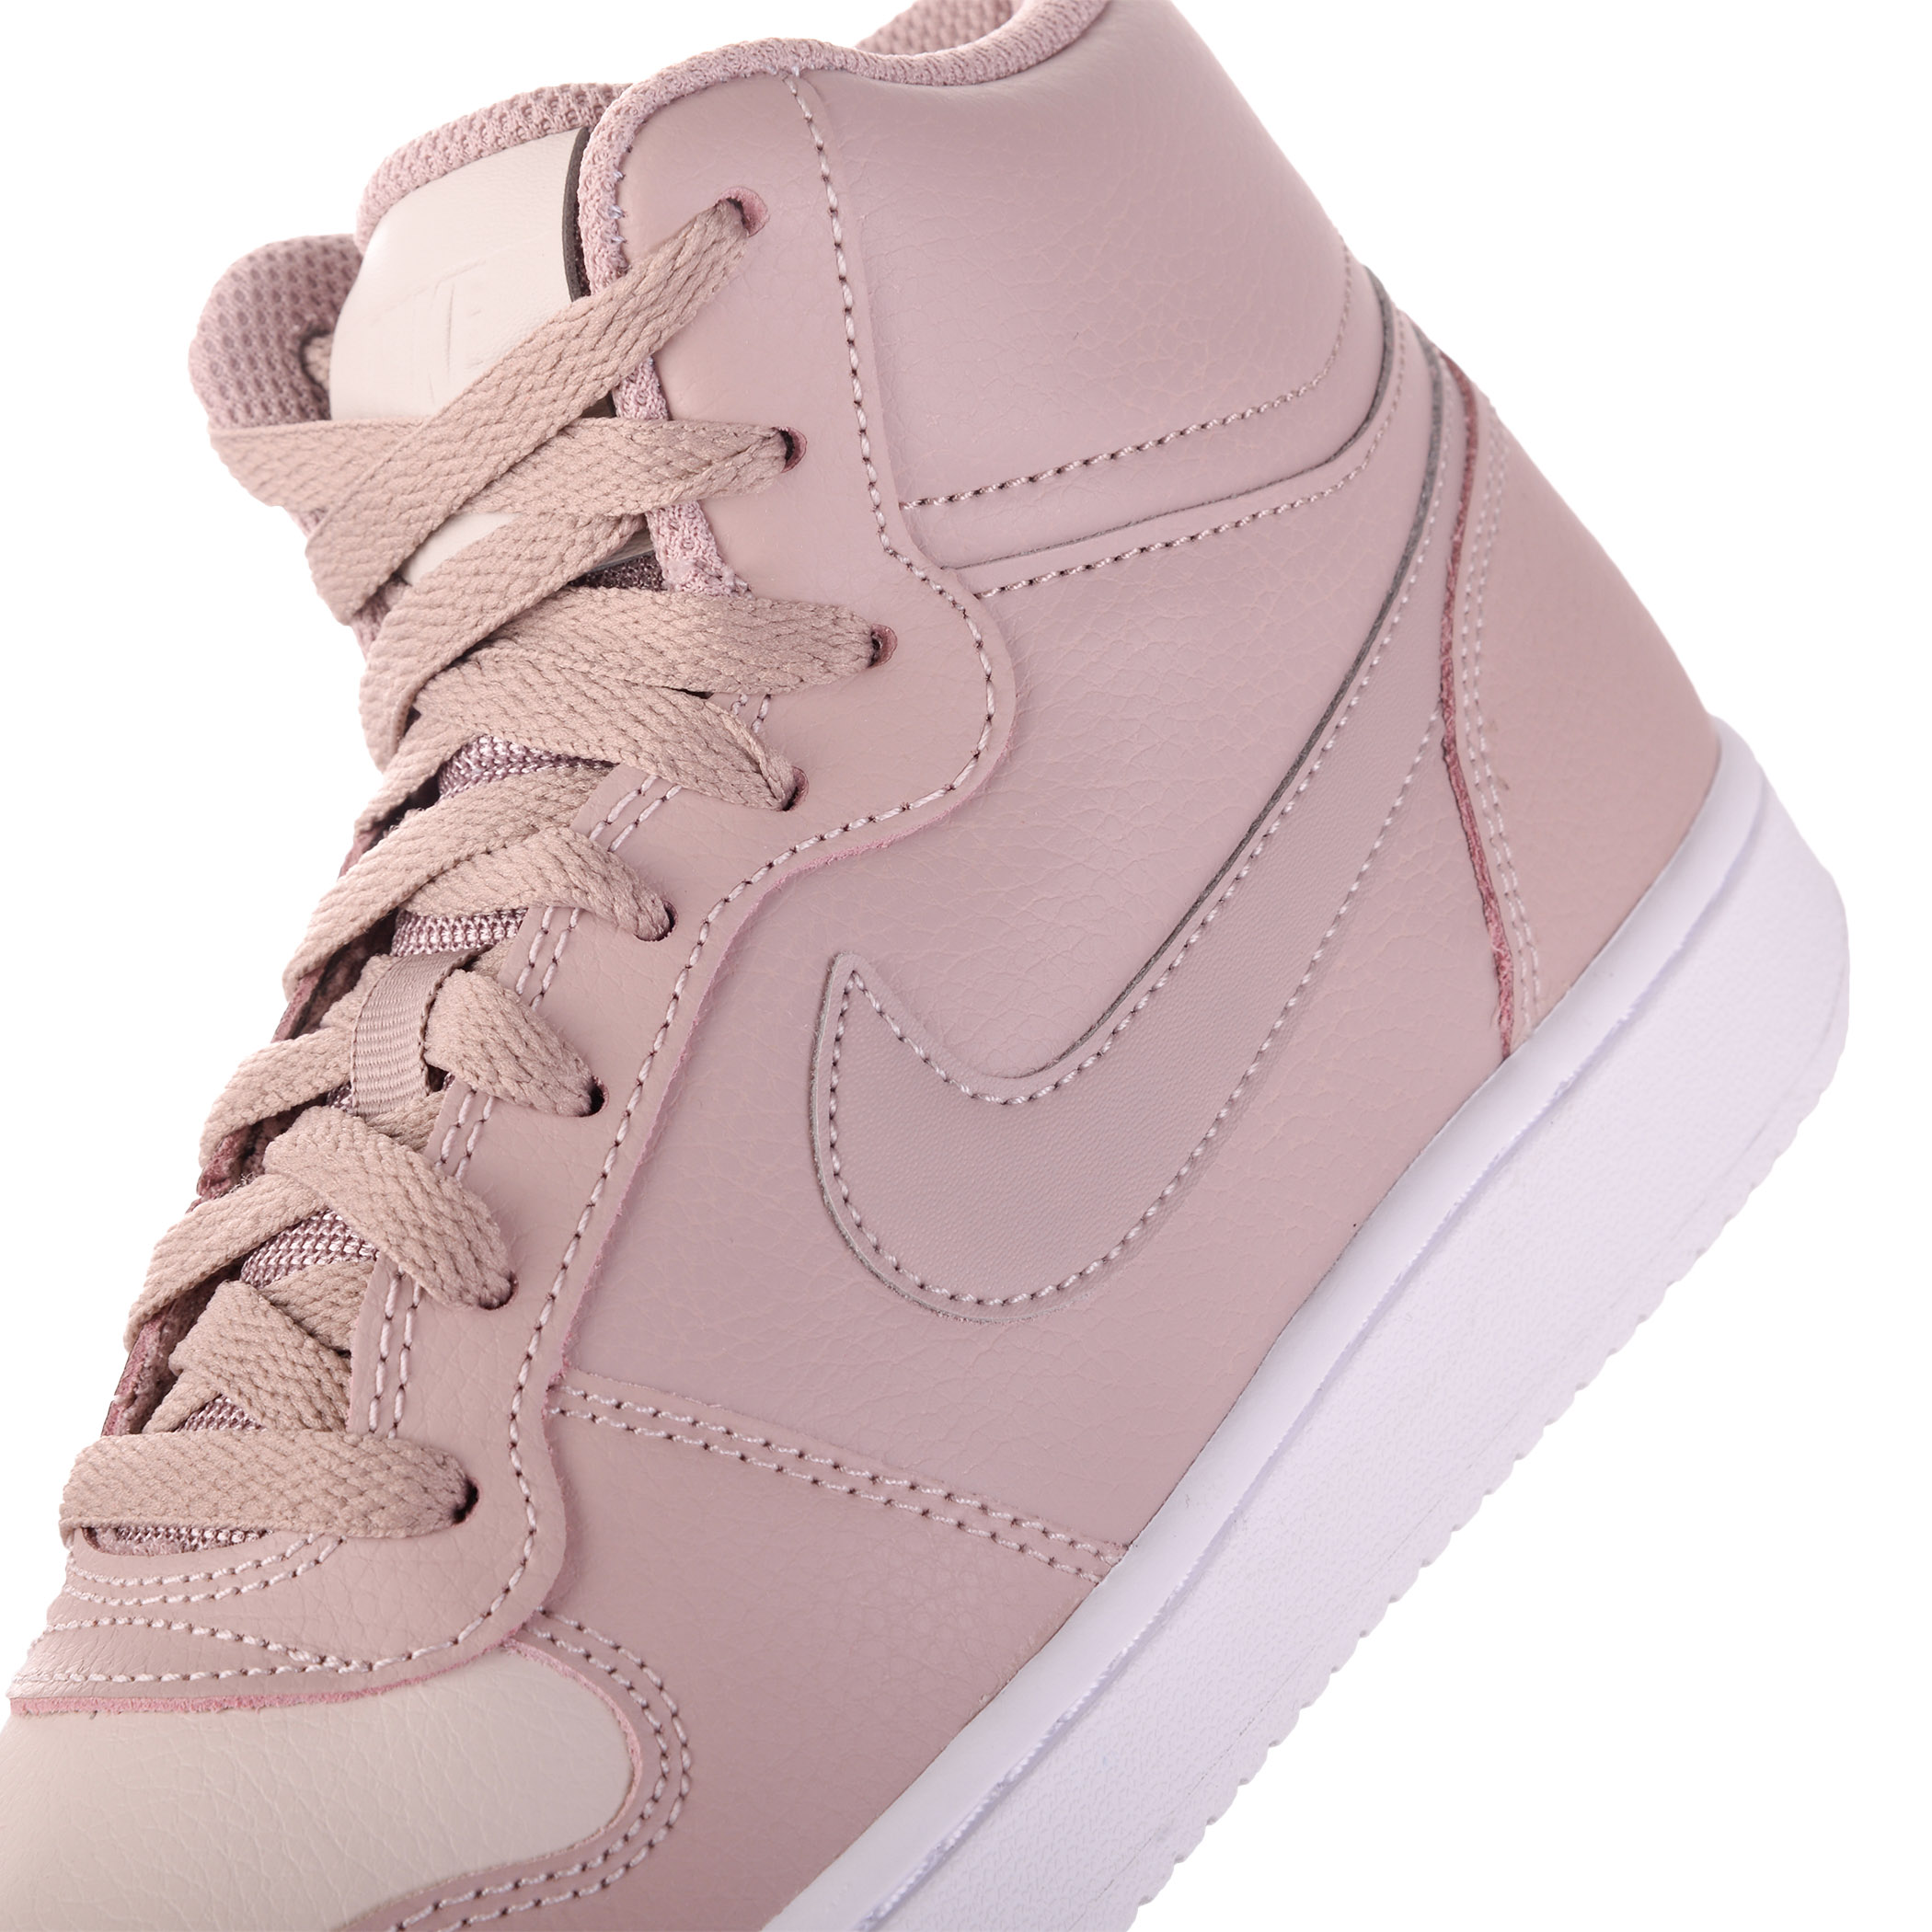 f51a7e5d Женские кеды Nike EBERNON MID Diffused Taupe/Diffused Taupe - фото 7